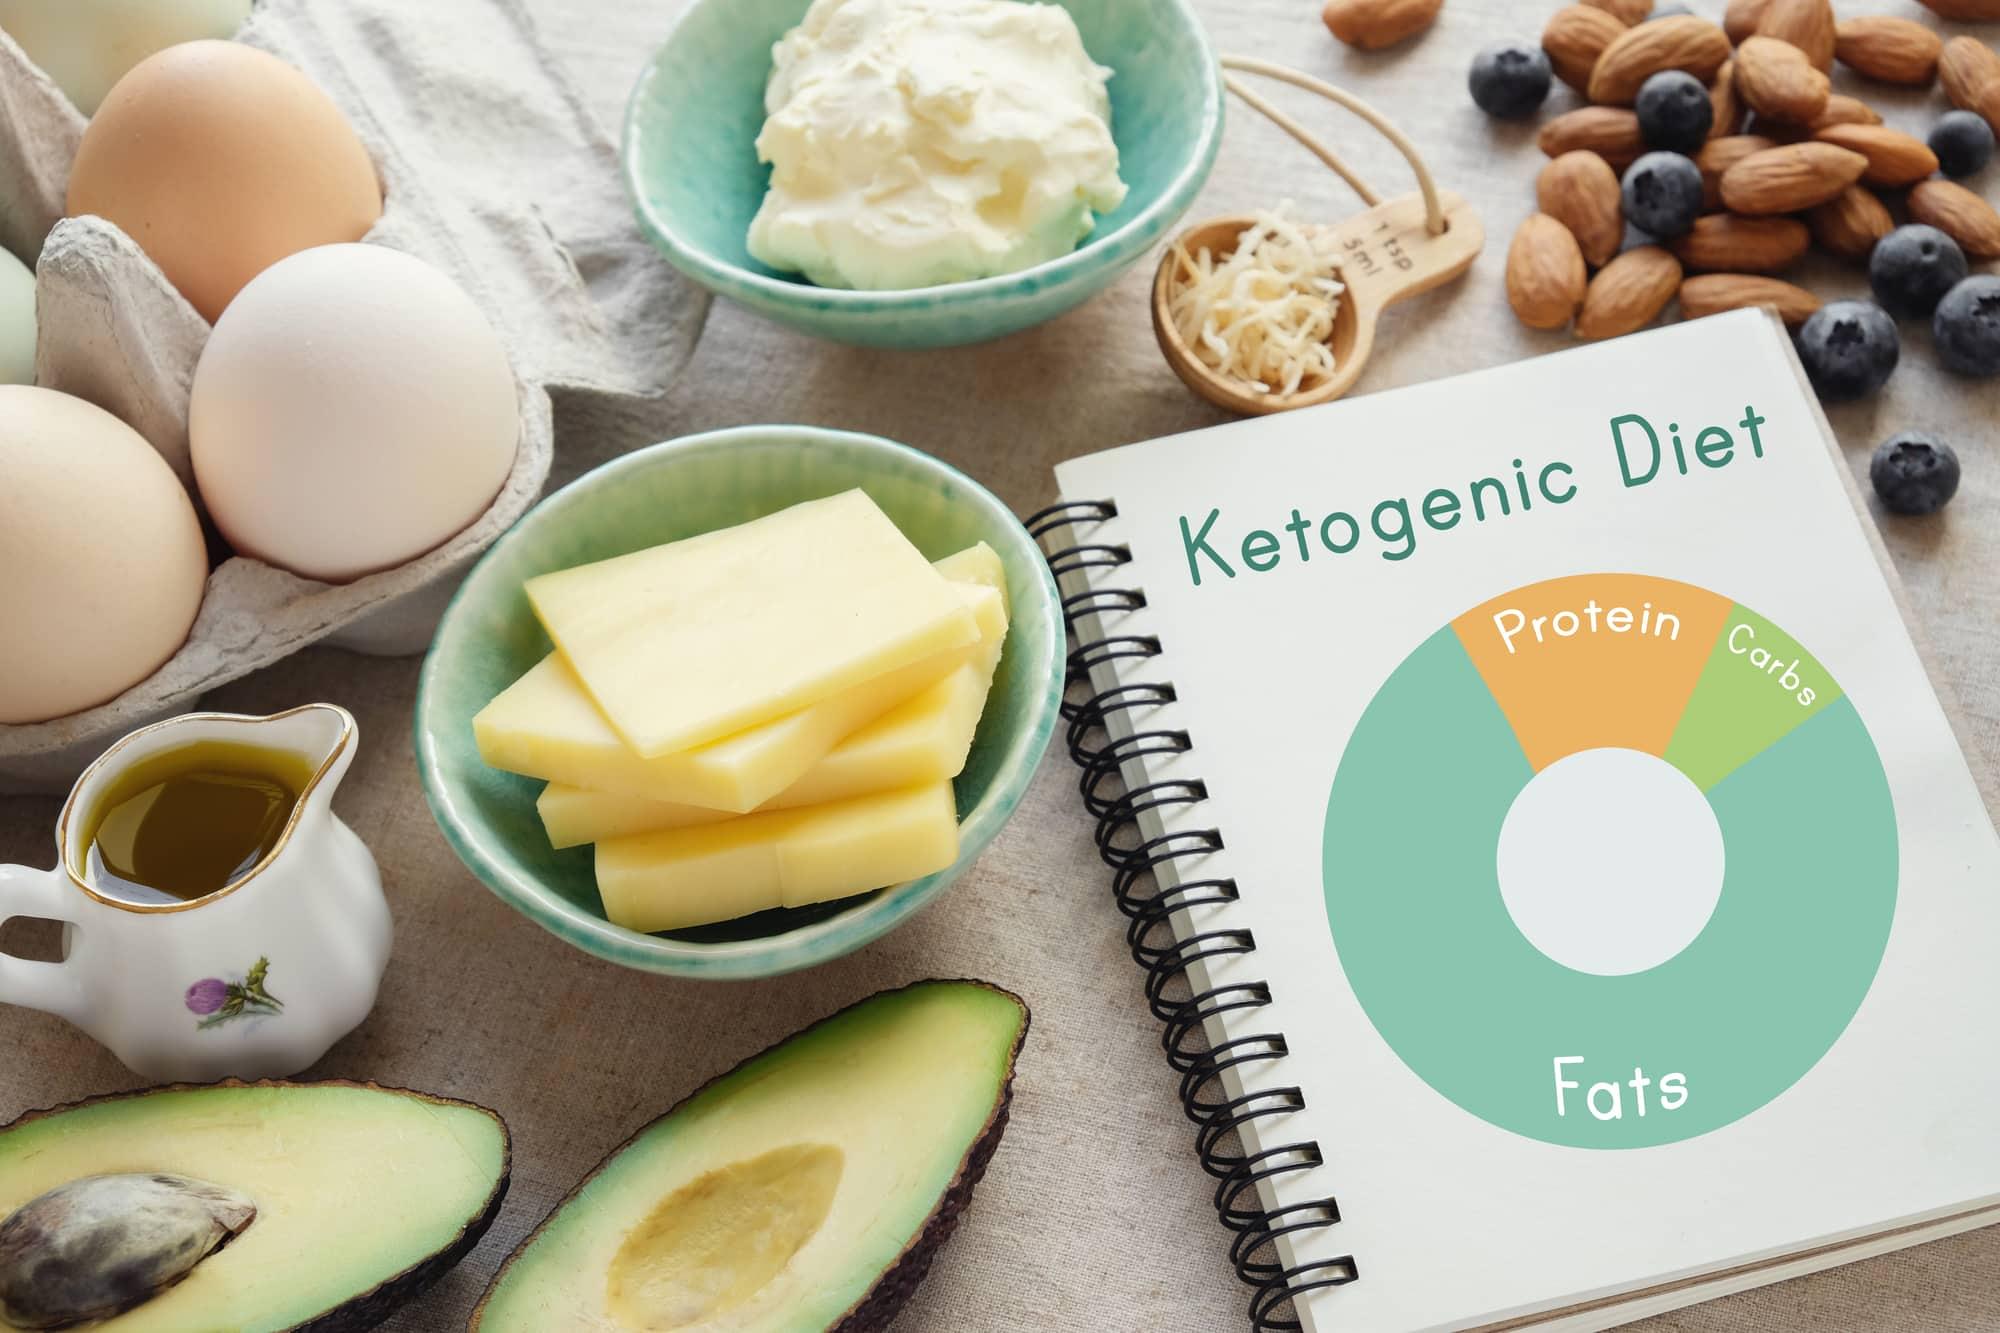 Symptome der ketogenen Ernährung